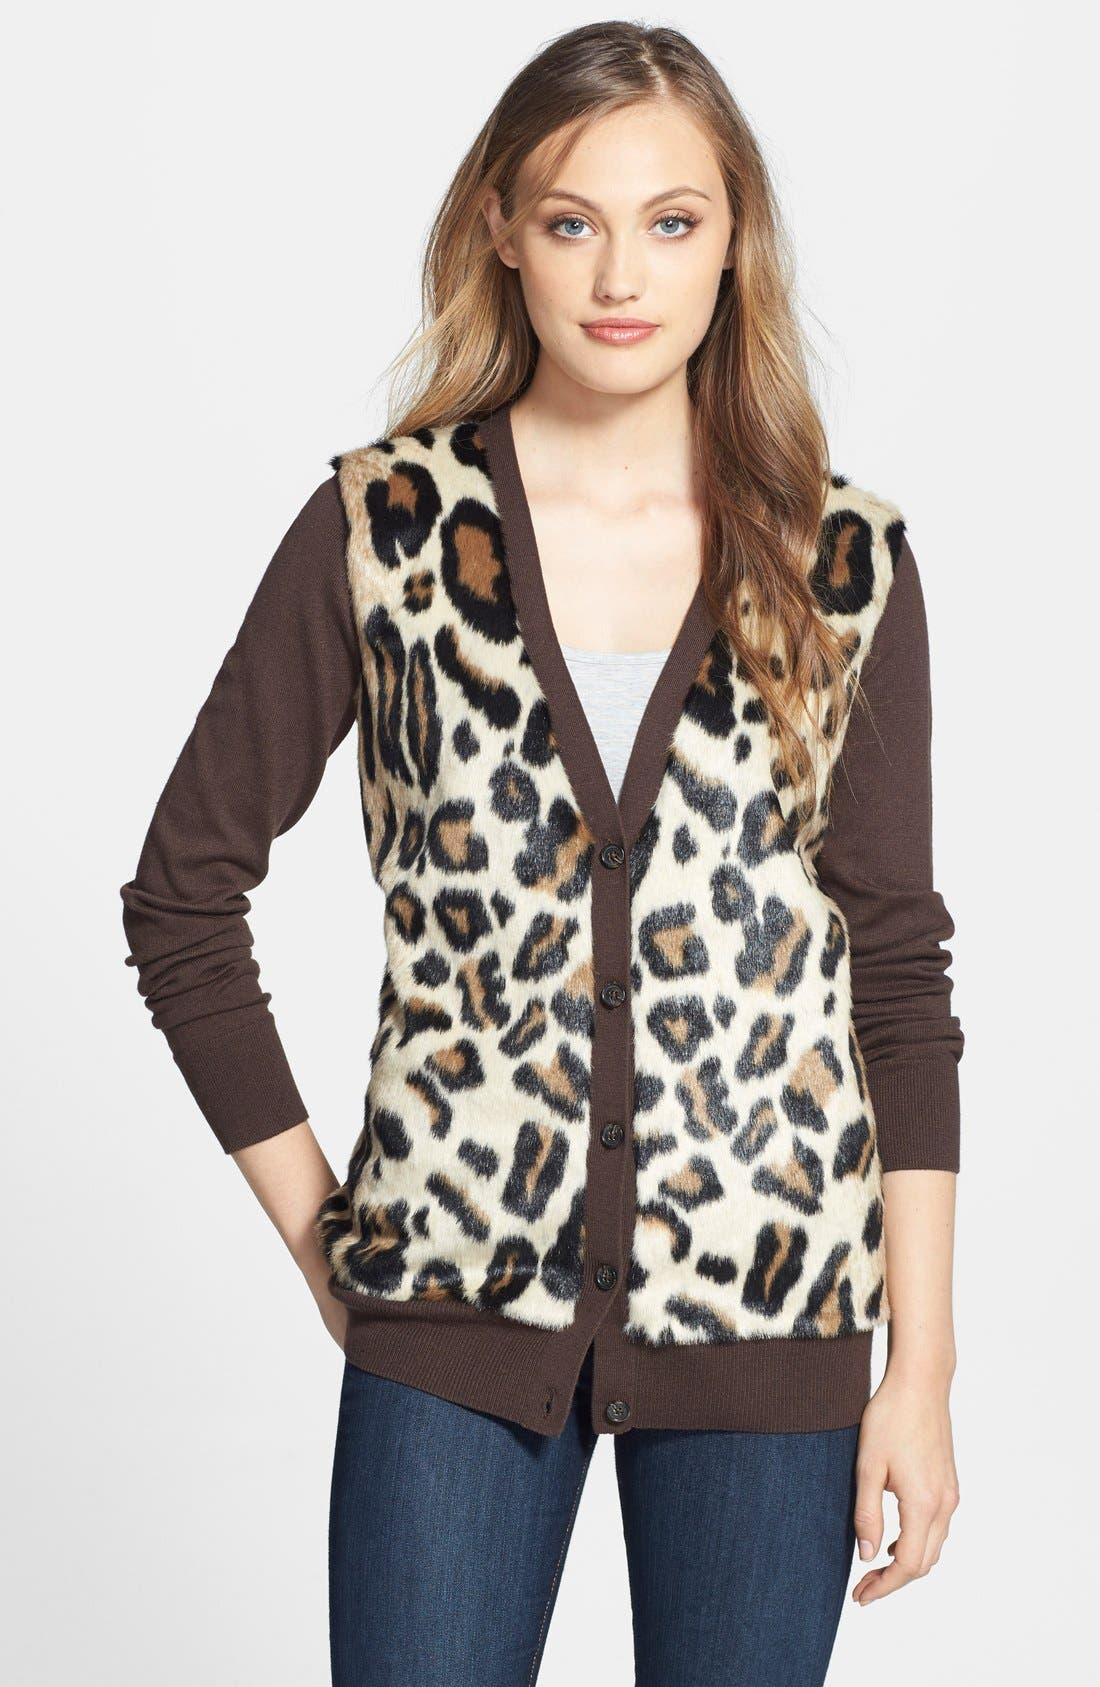 Alternate Image 1 Selected - MICHAEL Michael Kors Faux Fur Front Boyfriend Cardigan